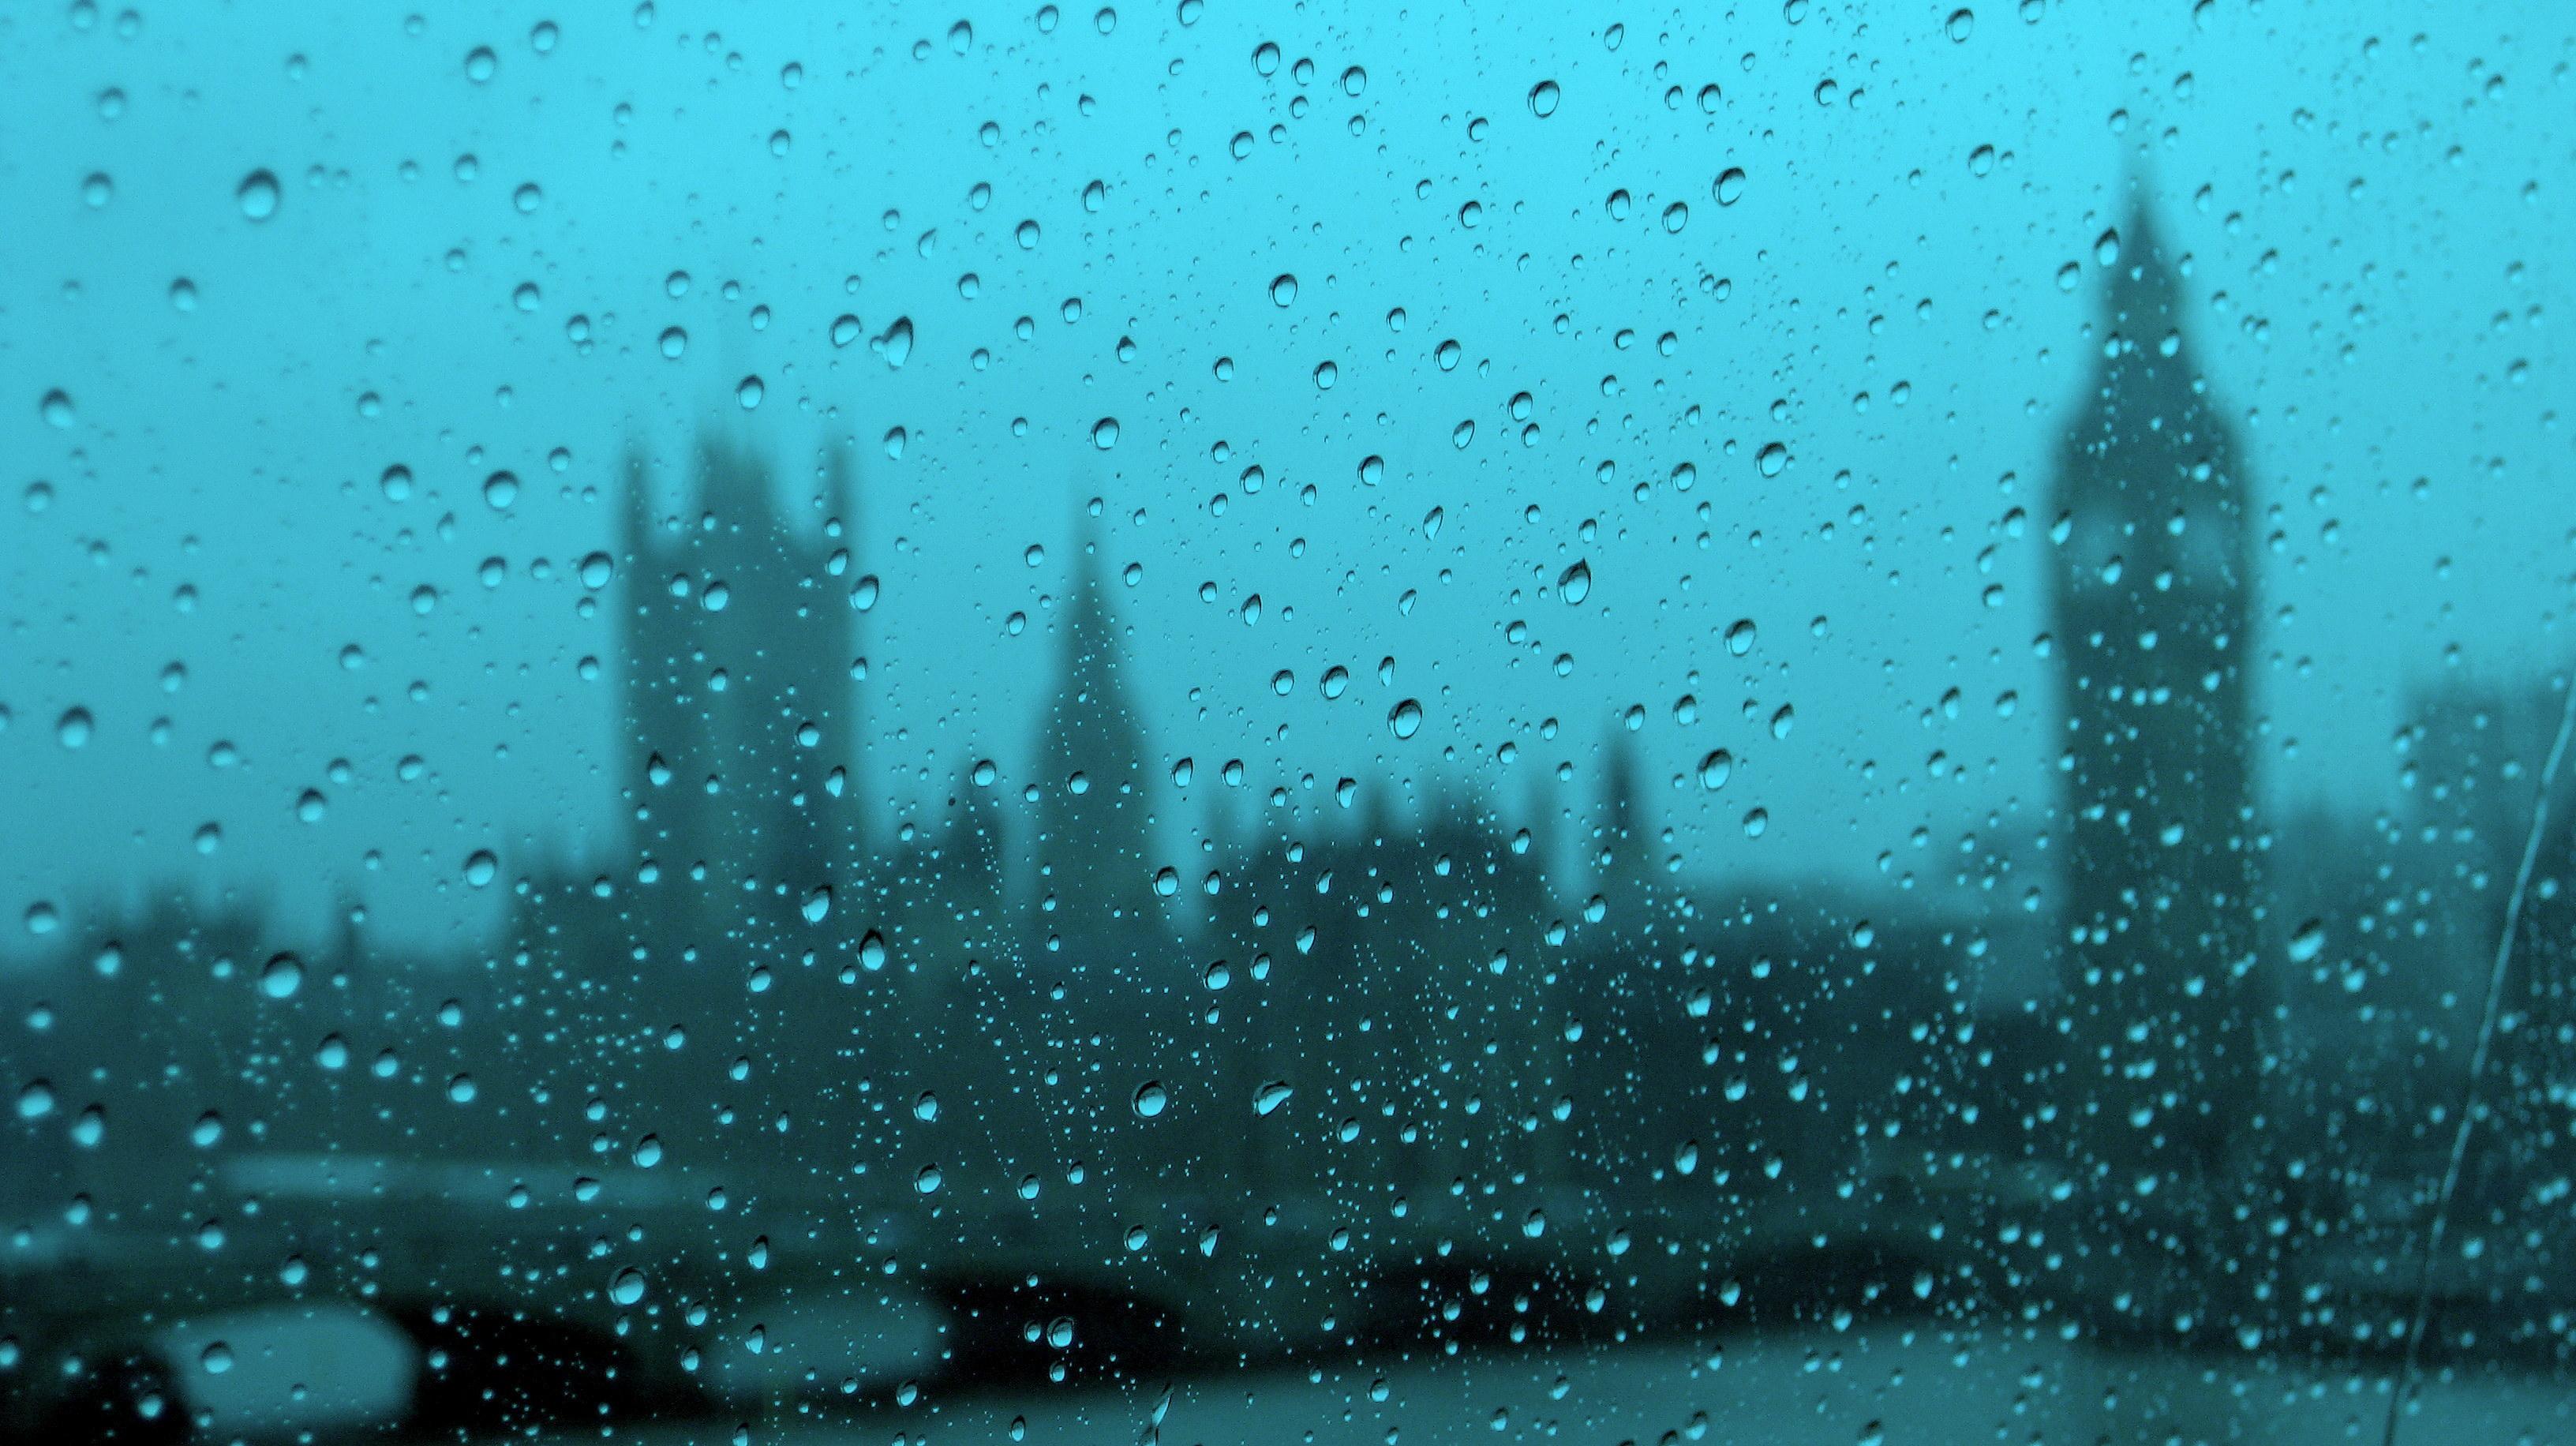 На рабочий стол обои капли дождя